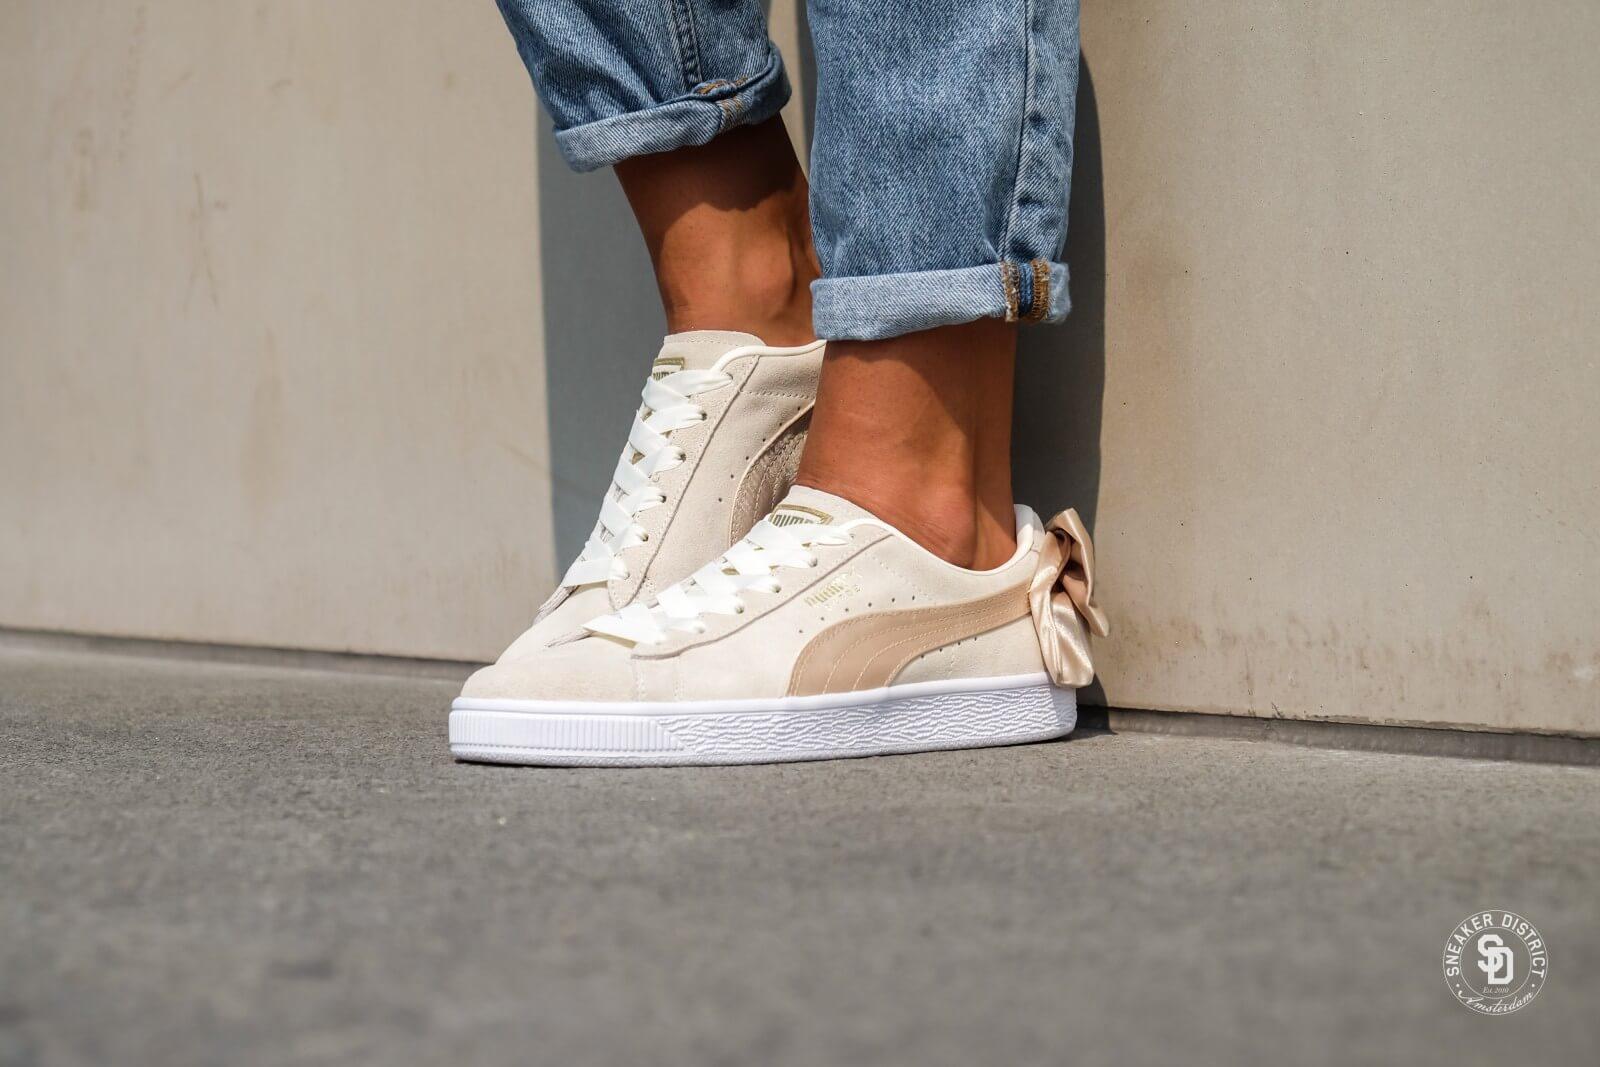 New Deals on PUMA Women's Suede Bow Varsity Sneaker